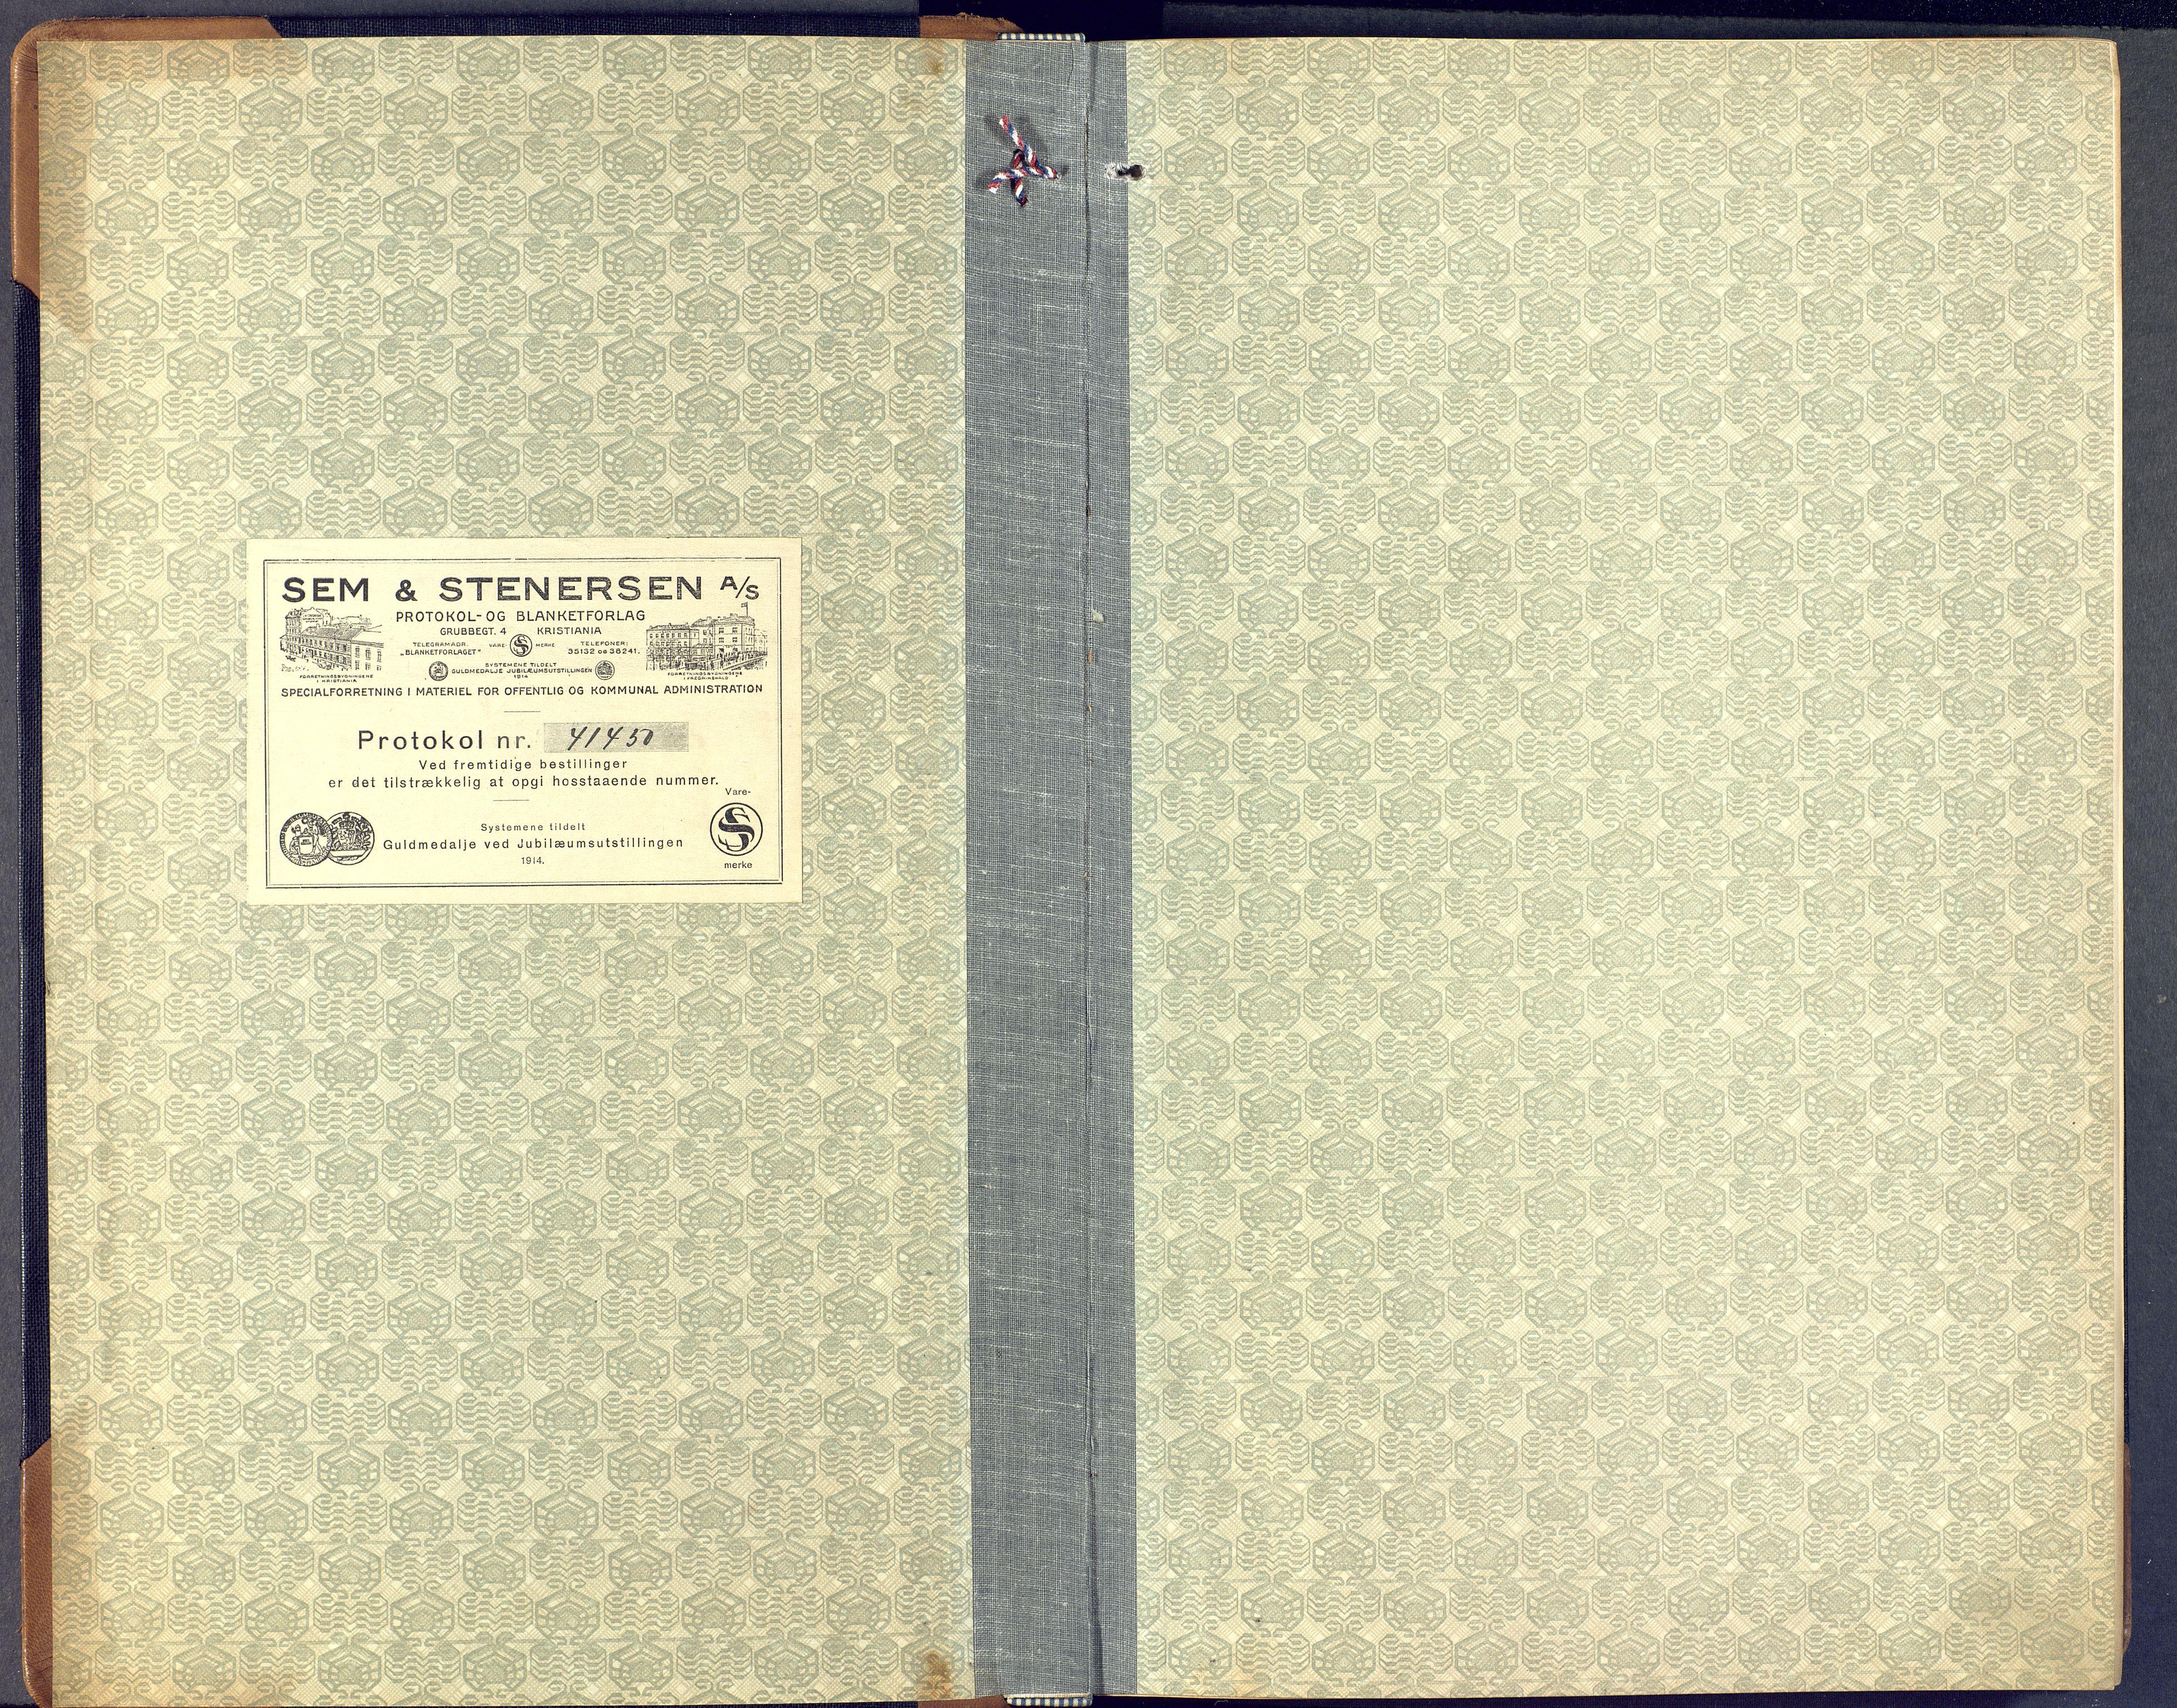 SAKO, Lunde kirkebøker, F/Fa/L0006: Ministerialbok nr. I 6, 1922-1940